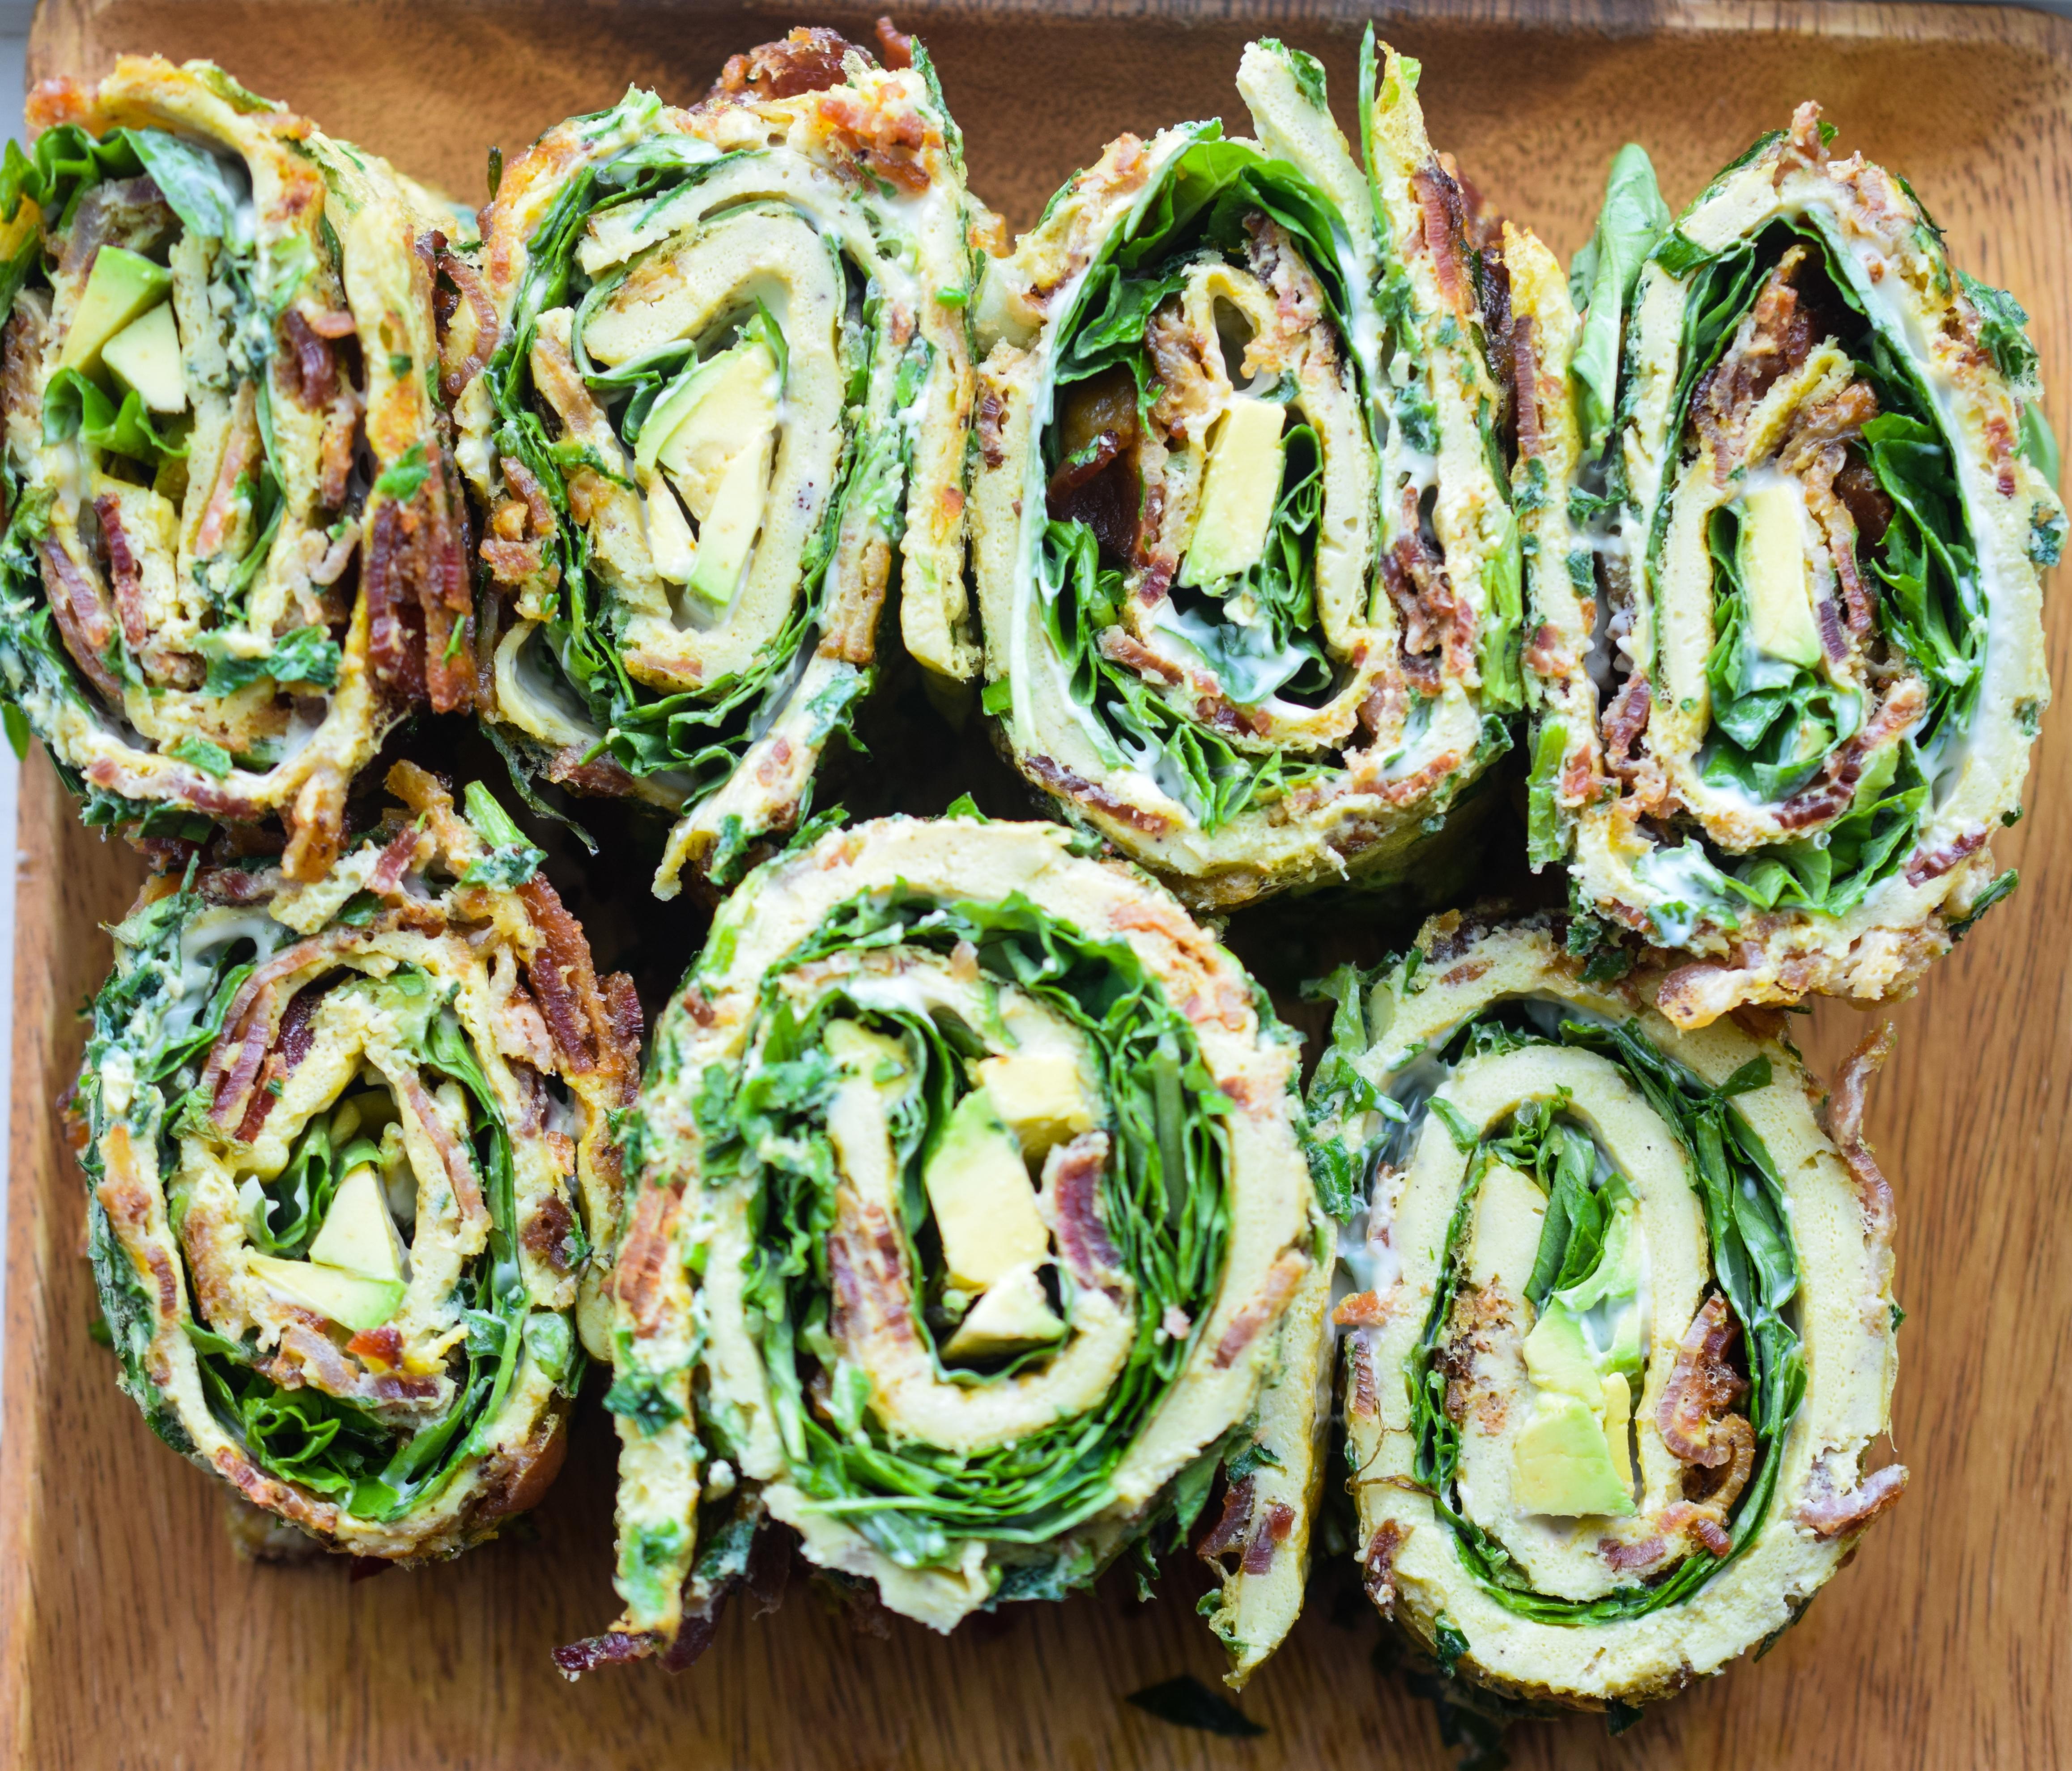 Egg Roll Up: Bacon, Basil + Greens (Whole30, Paleo, Keto, LCHF) – Castaway Kitchen